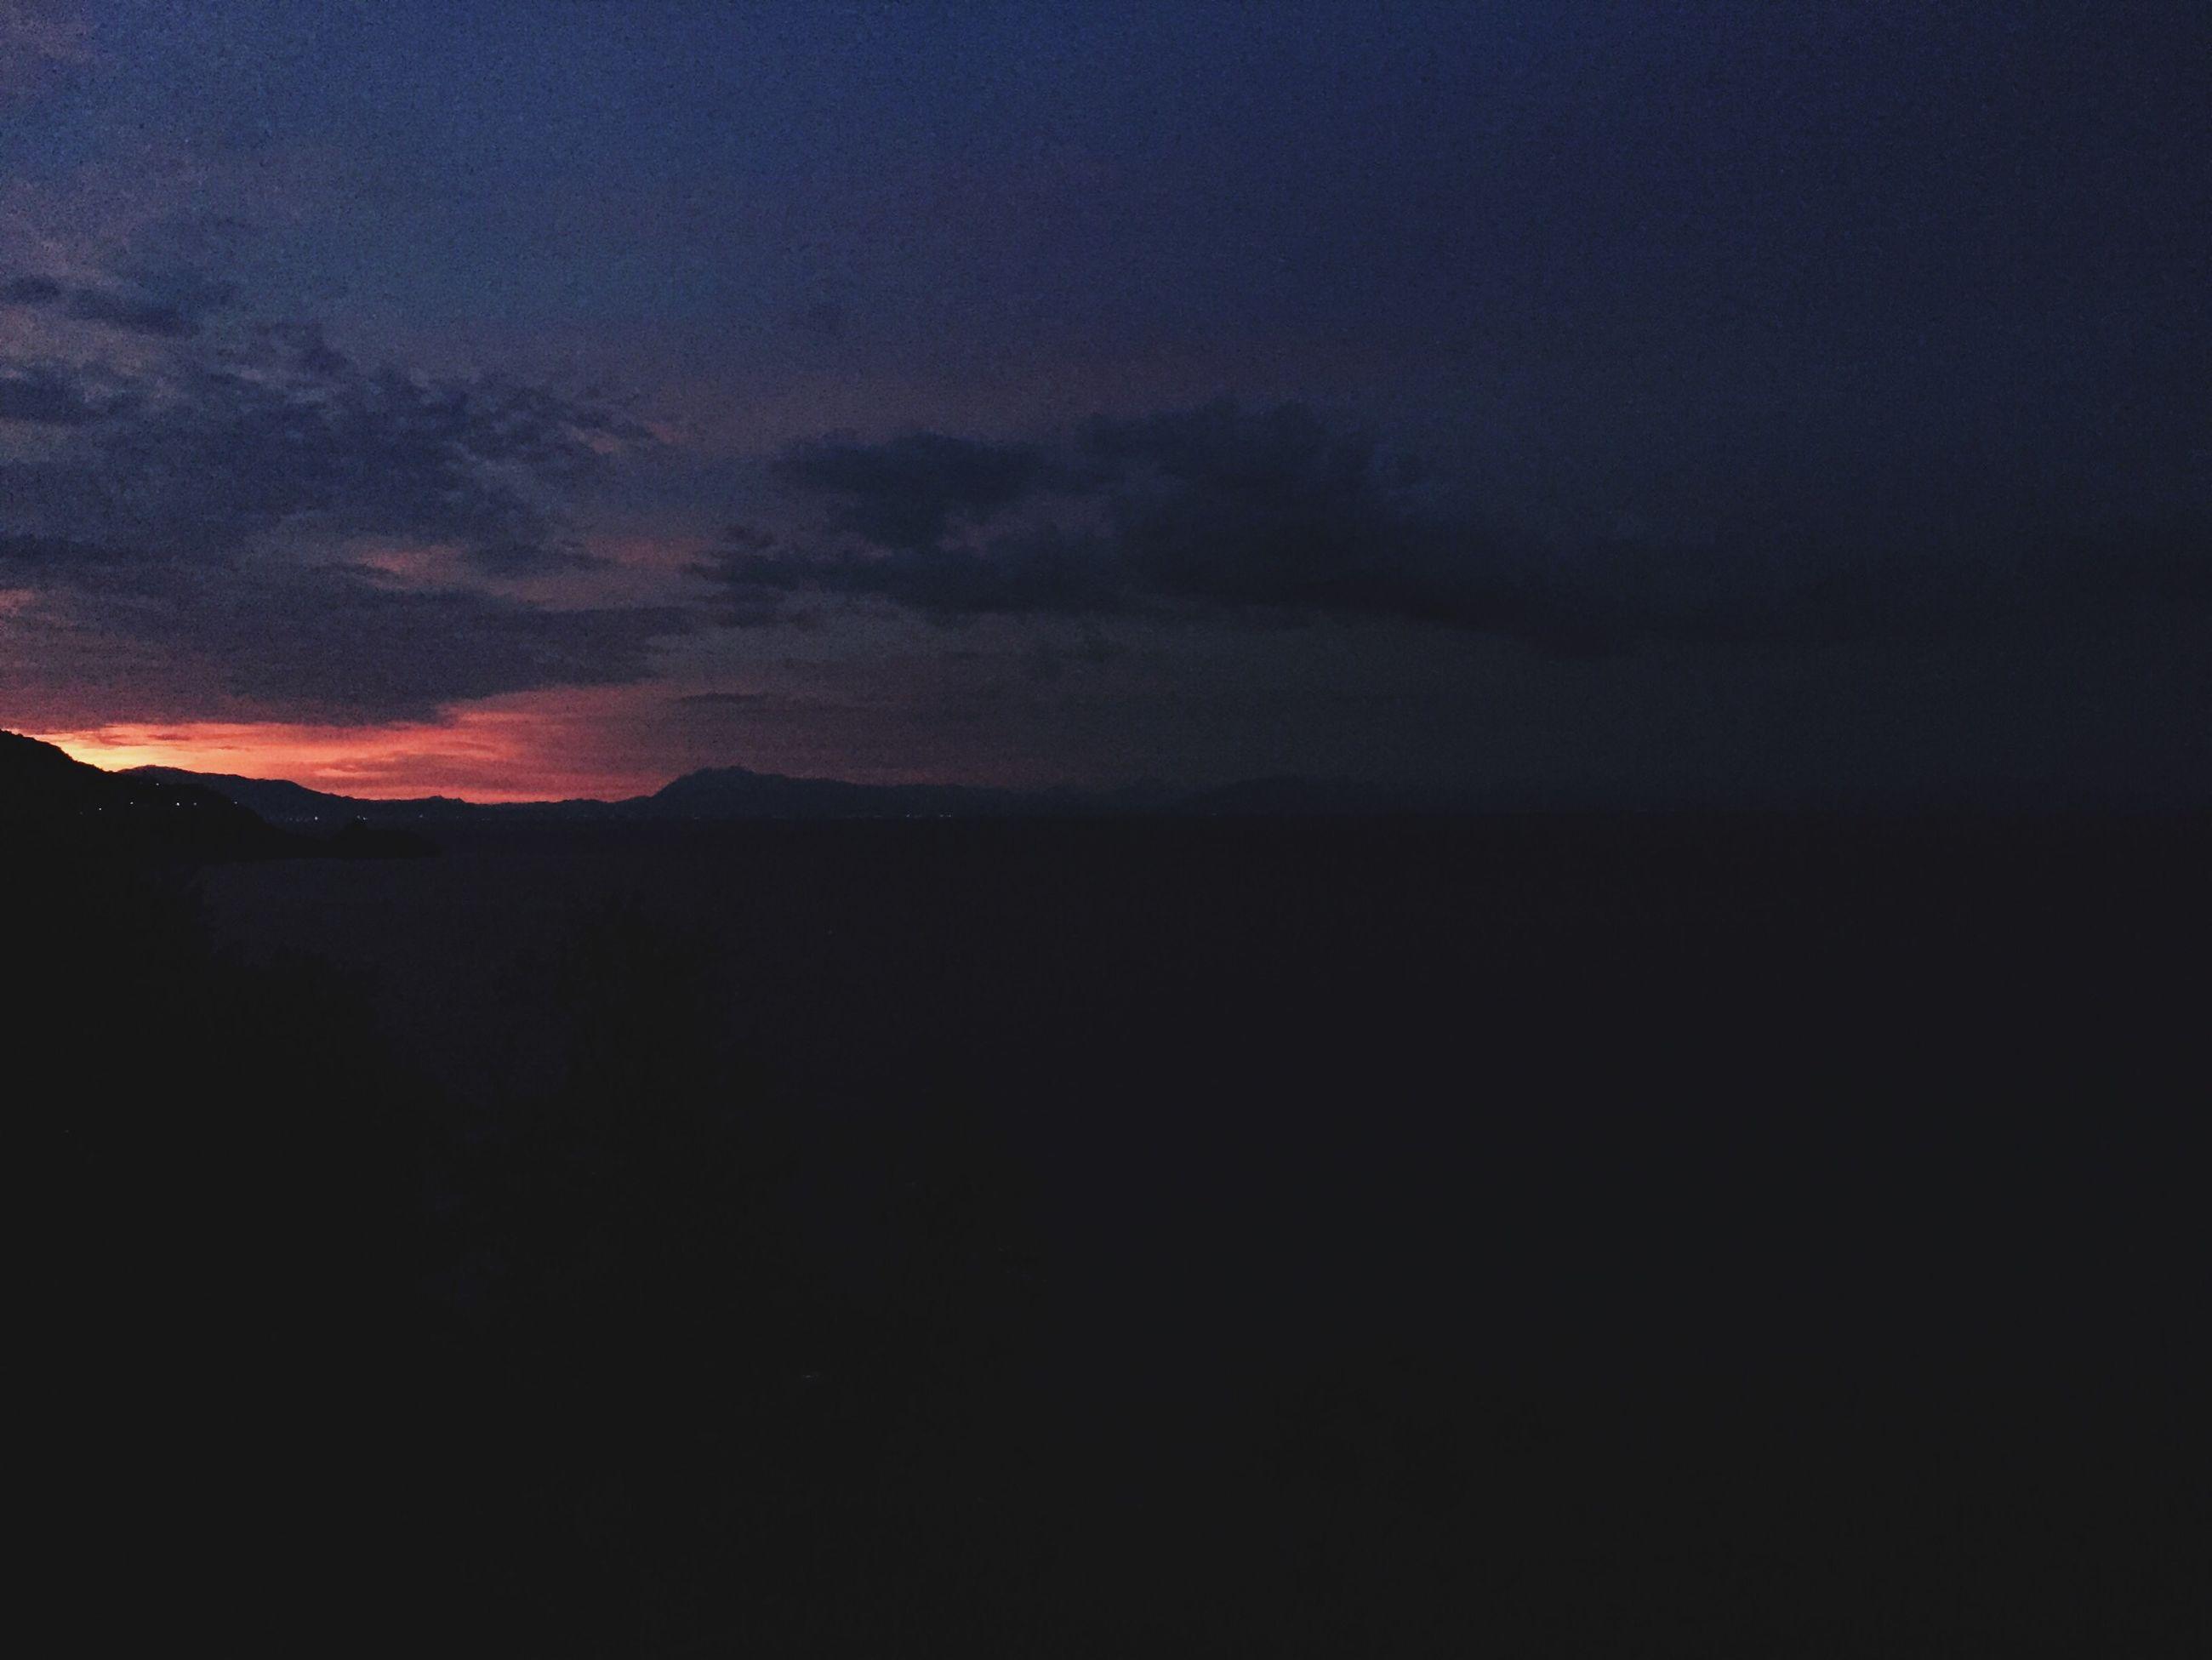 silhouette, scenics, tranquil scene, sky, sunset, beauty in nature, tranquility, nature, dark, cloud - sky, landscape, idyllic, dusk, copy space, dramatic sky, mountain, majestic, cloud, outdoors, orange color